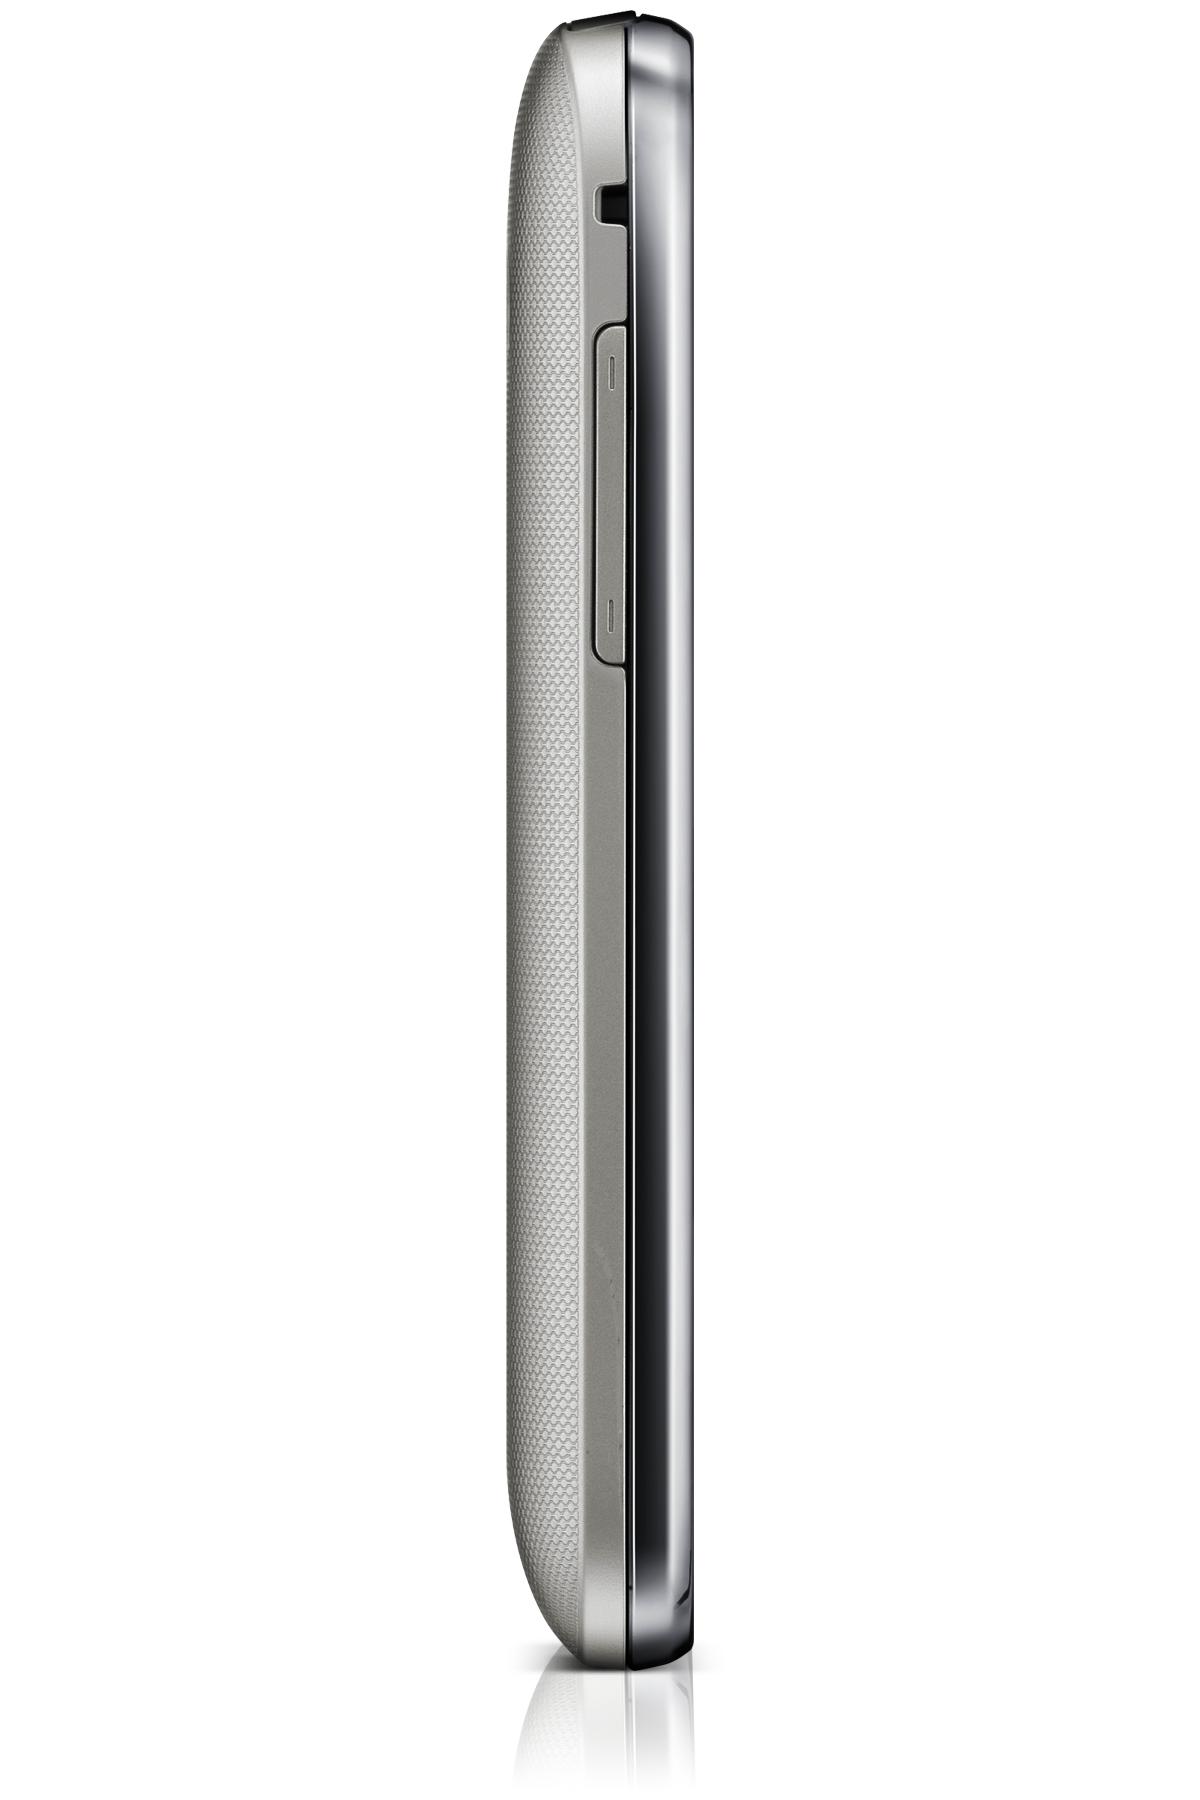 GT-S5360 Kiri